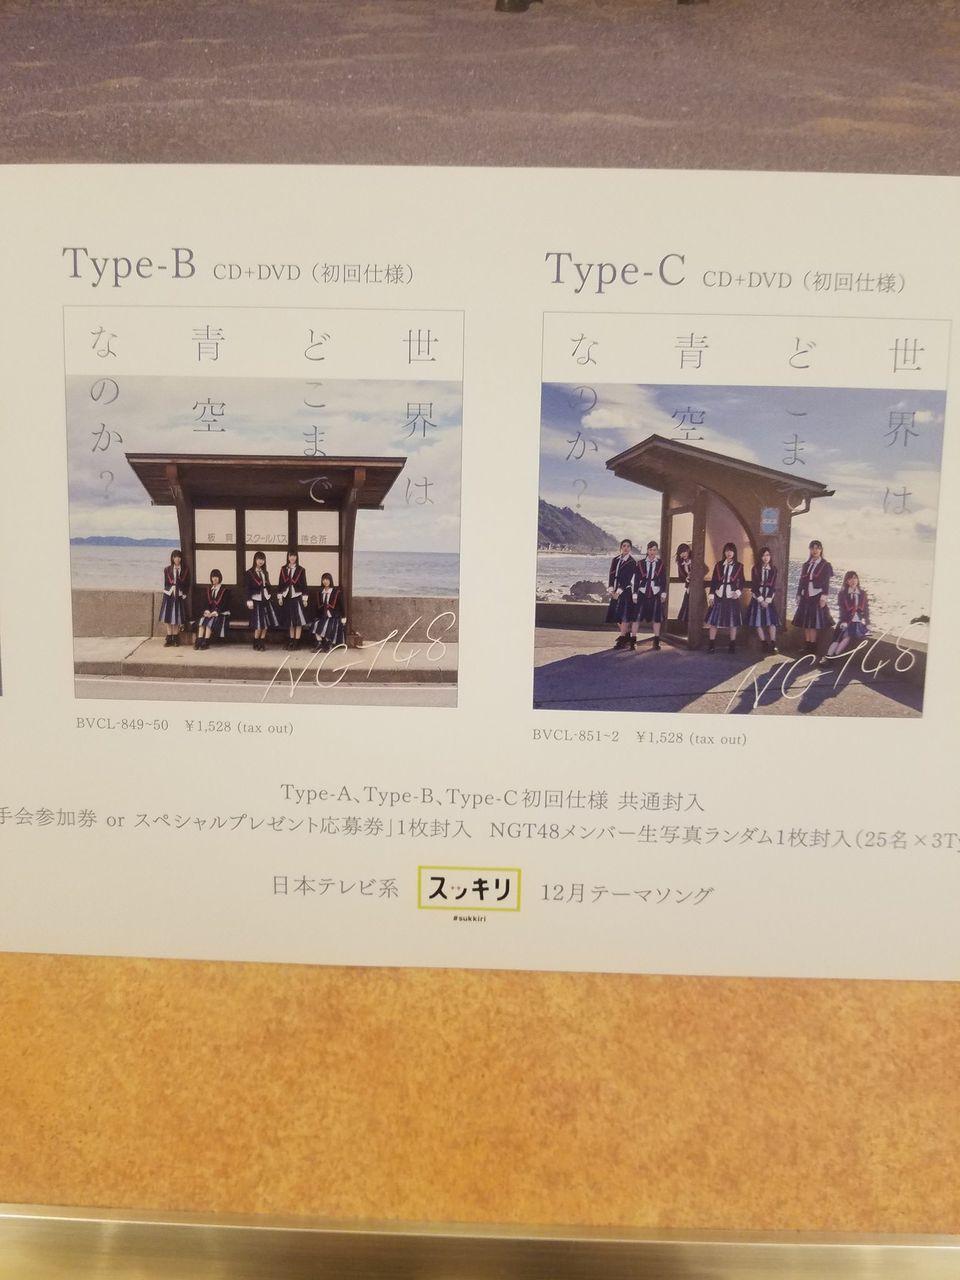 NGT48 セカンドシングル「世界はどこまで青空なのか?」日本テレビ系「スッキリ」12月テーマソングに決定!